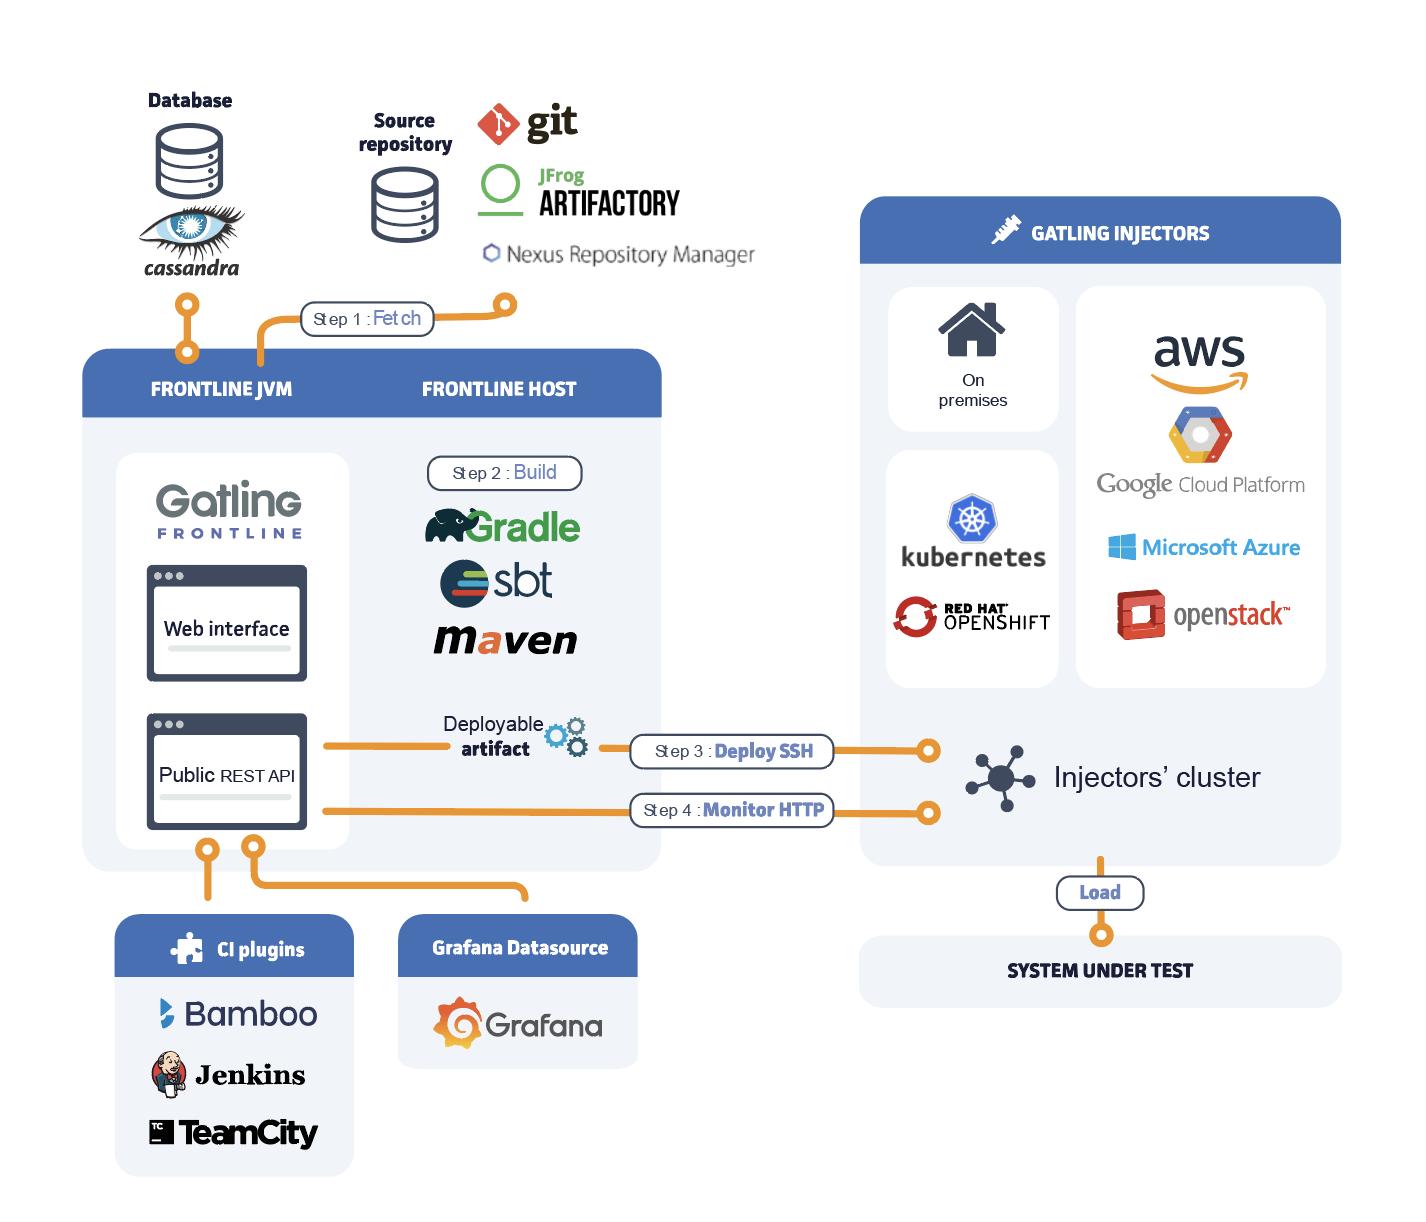 Gatling Enterprise Architecture - Step 3